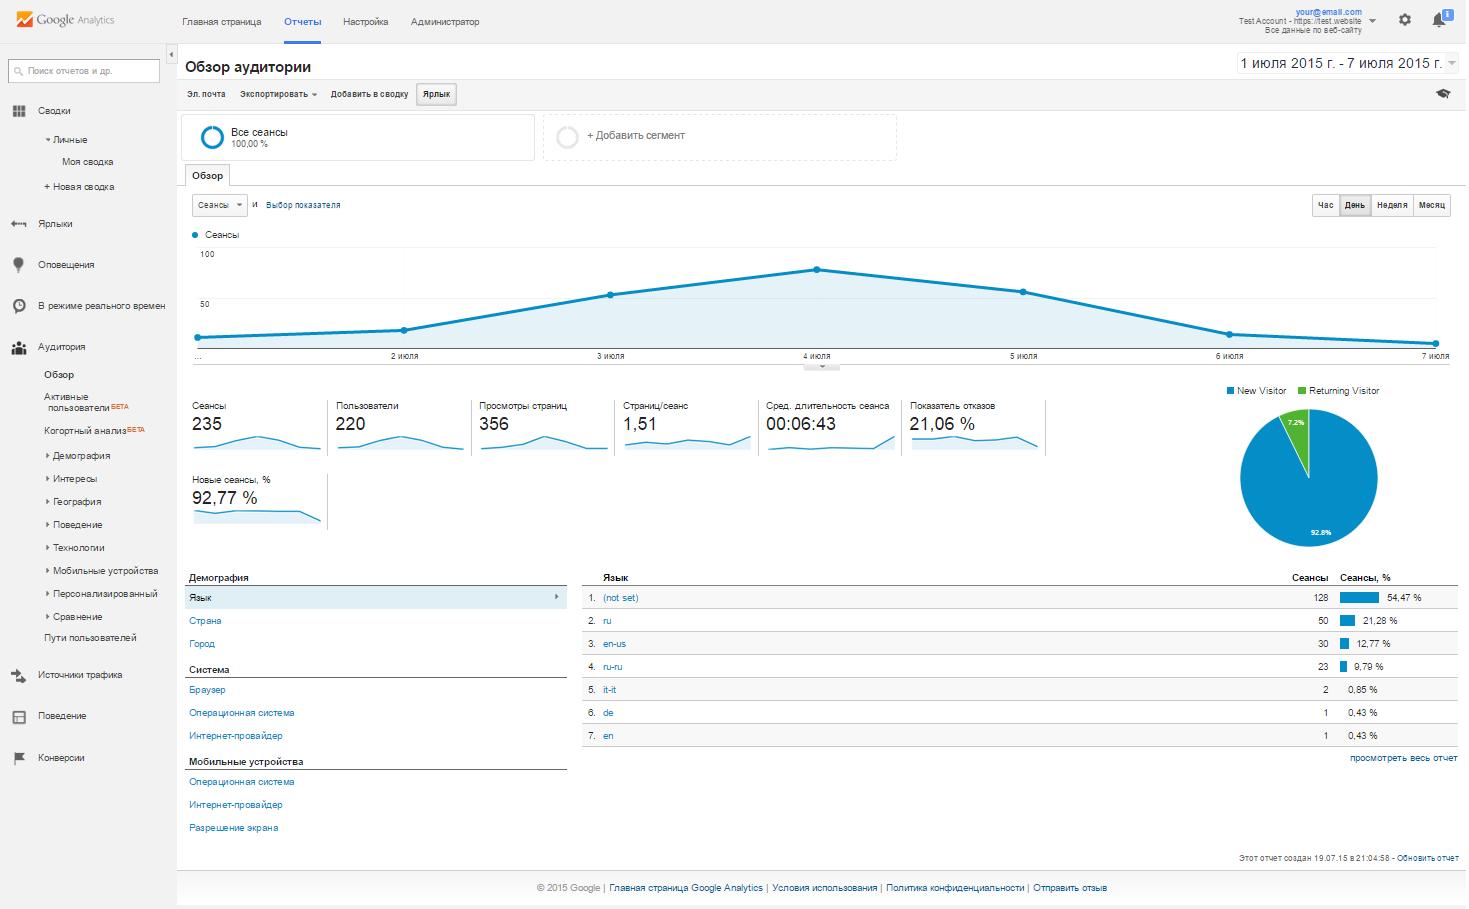 Обзор аудитории Google Analytics